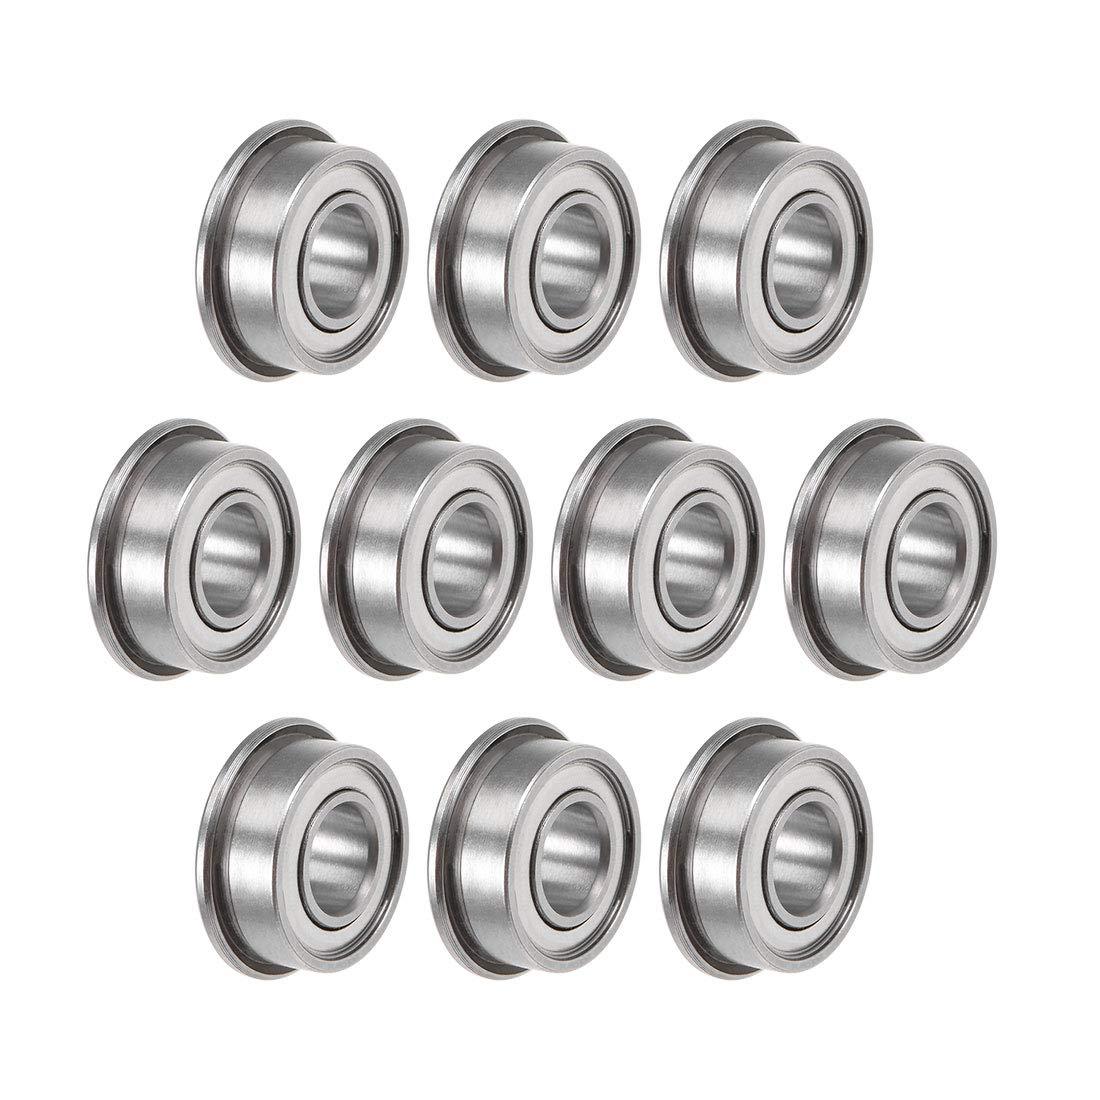 uxcell F686ZZ Flange Ball Bearing 6x13x5mm Shielded Chrome Bearings 10pcs